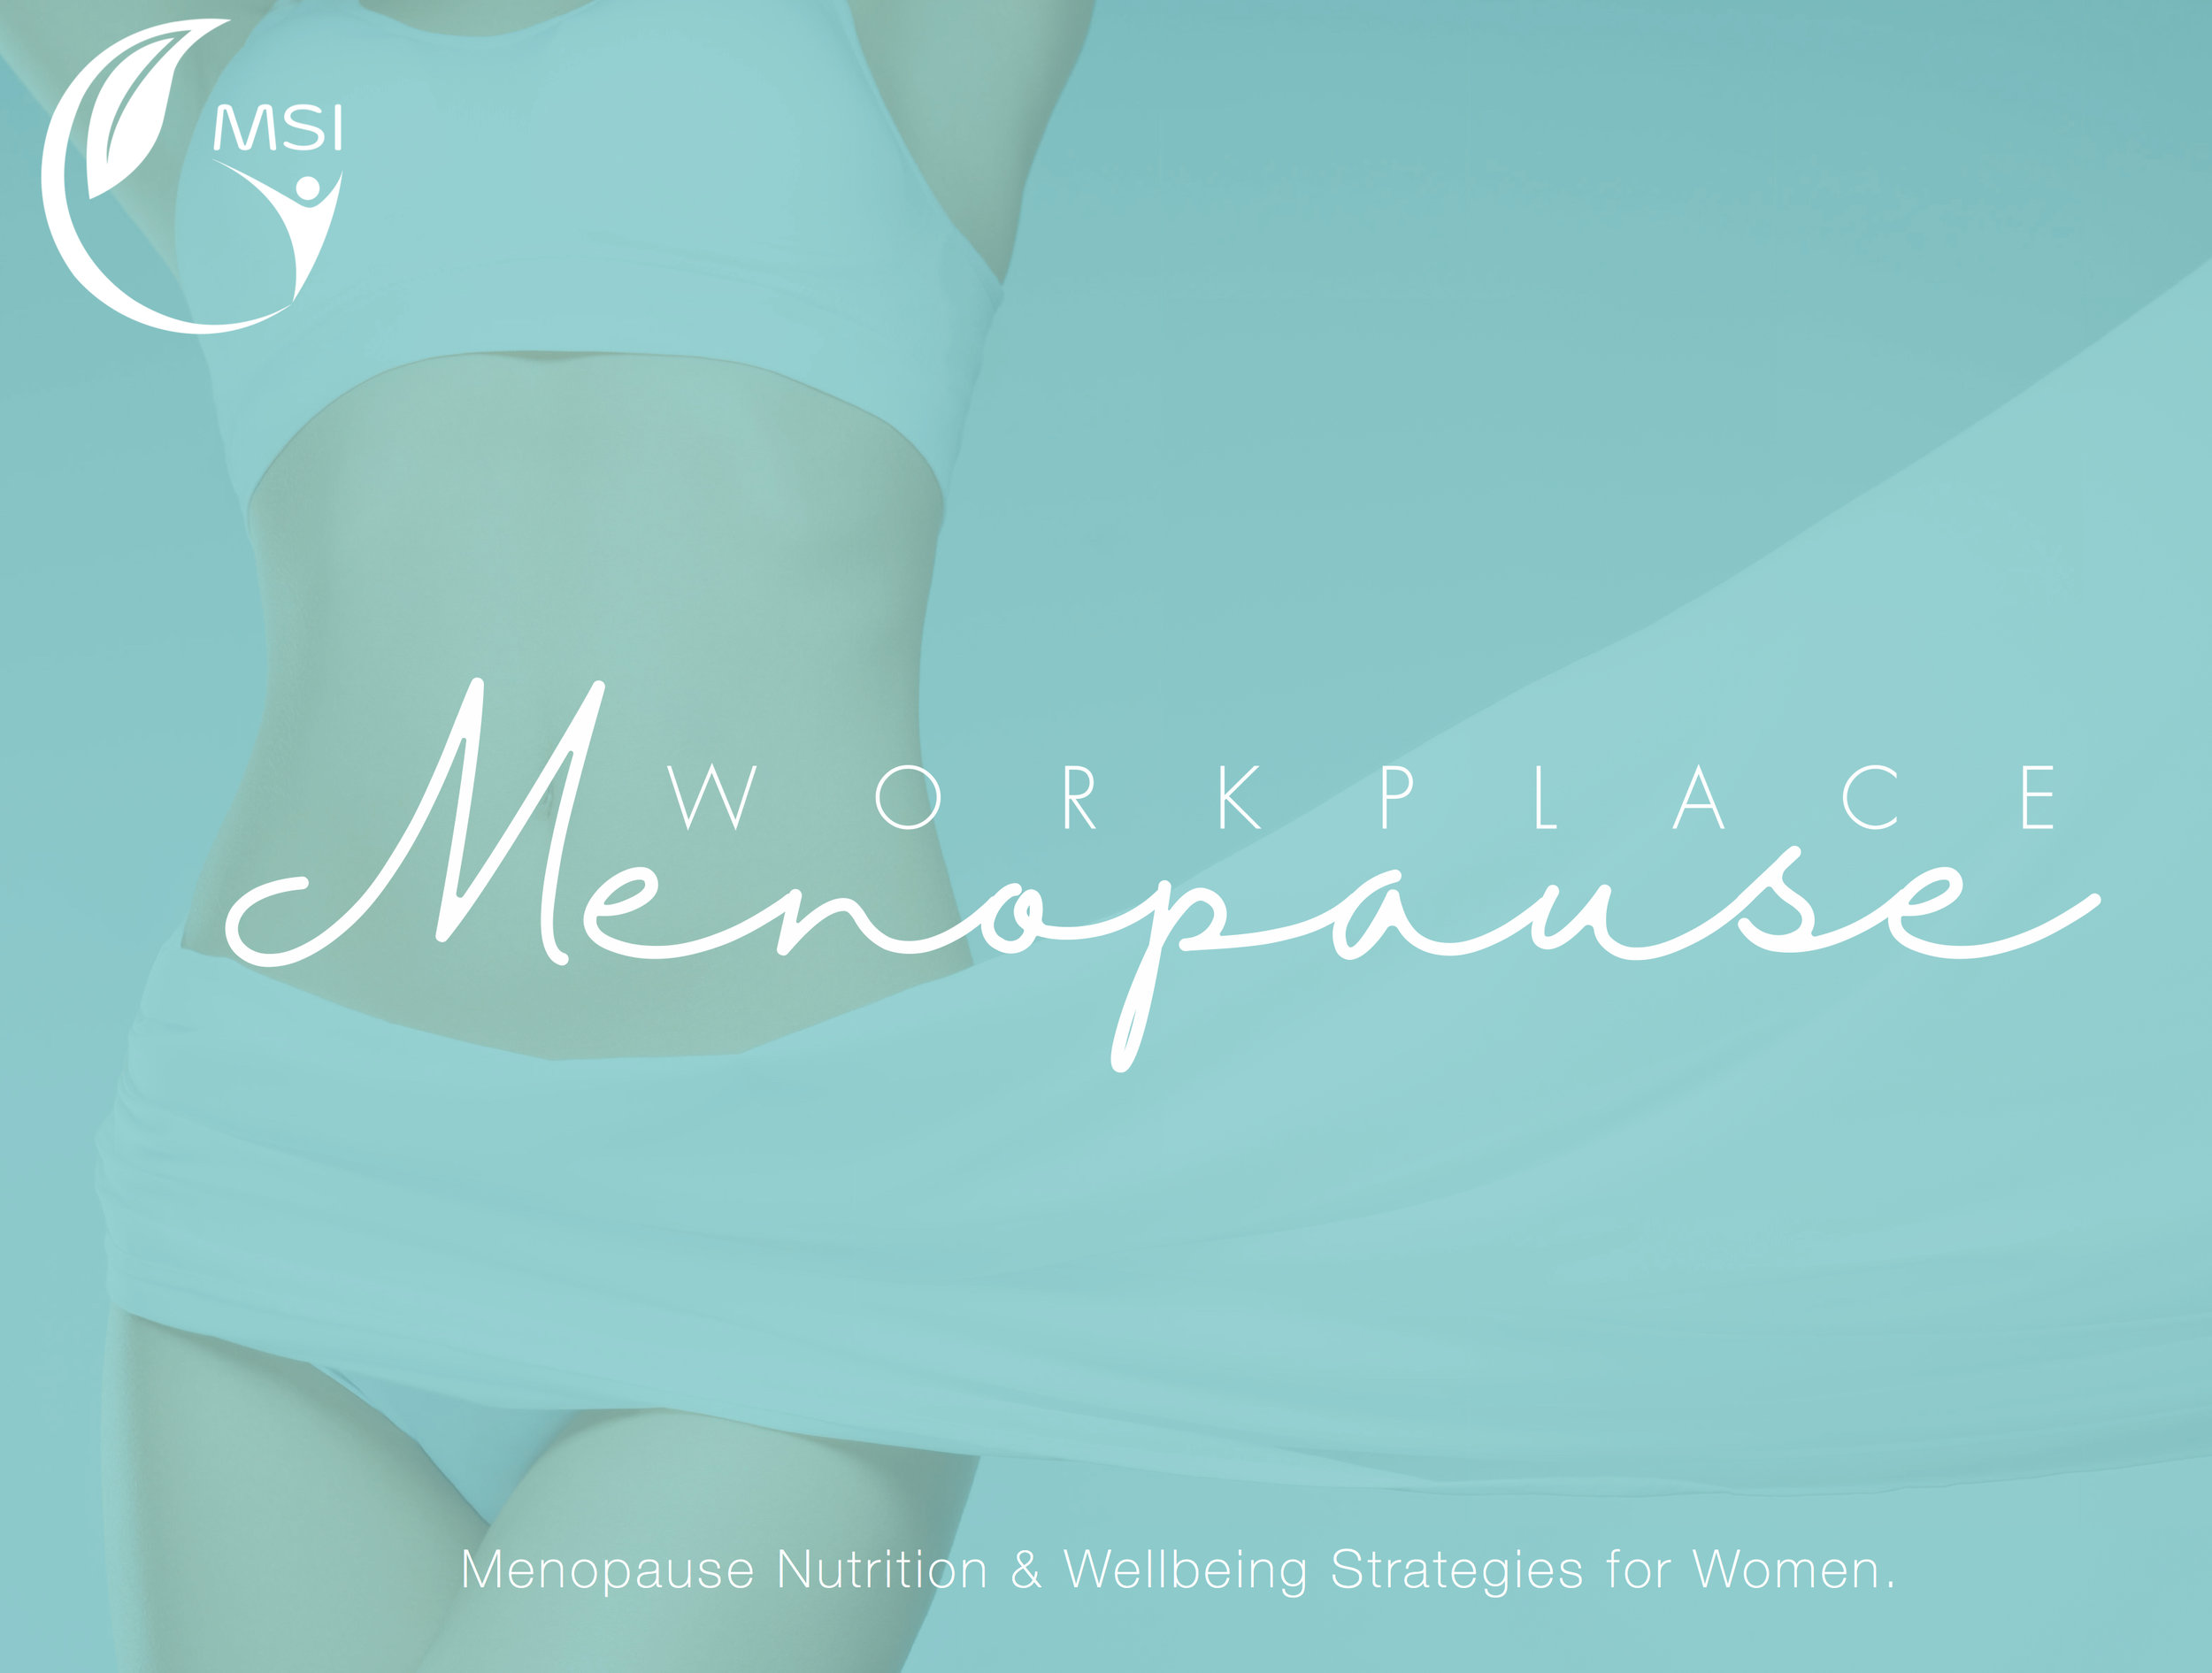 Menopause Brochure.key.jpg